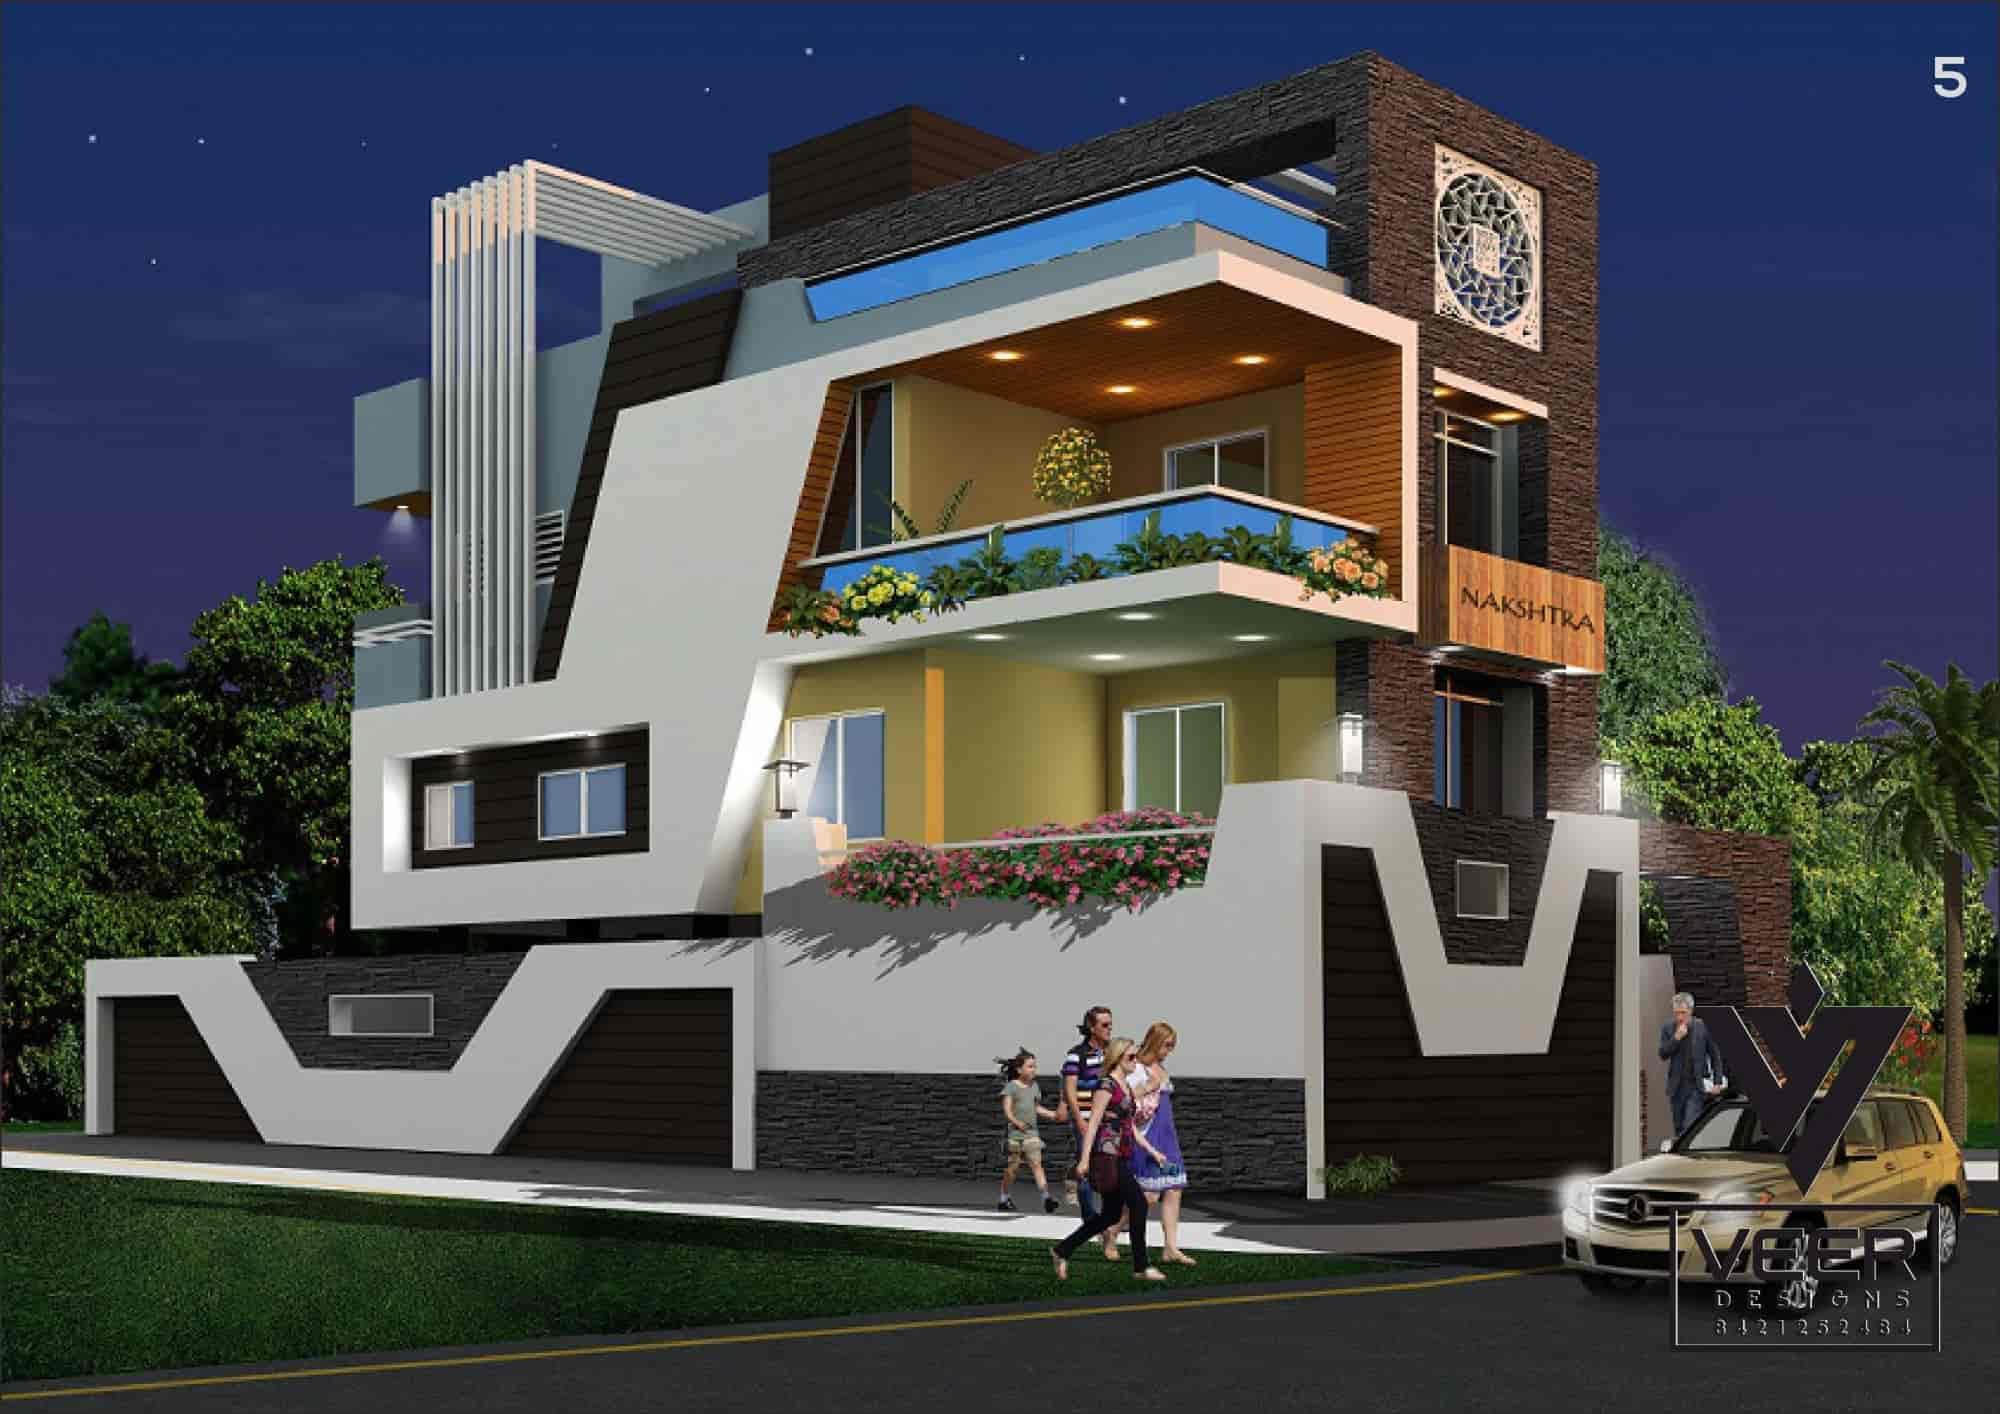 Peachy Veer Creative Design Pvt Ltd Wagholi Commercial Interior Interior Design Ideas Helimdqseriescom